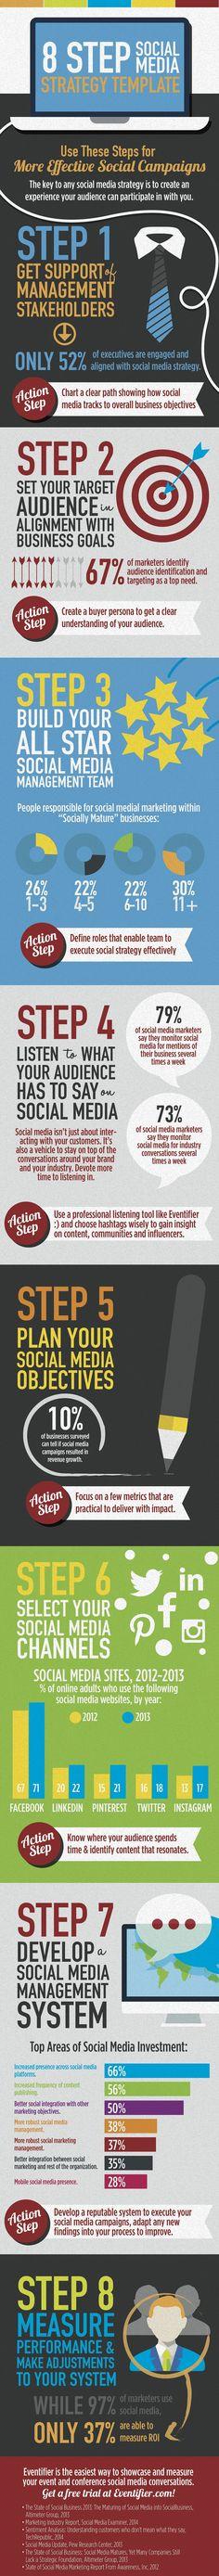 8 Step Social Media Marketing Strategy Template #infographic #SocialMedia #SMM #Marketing